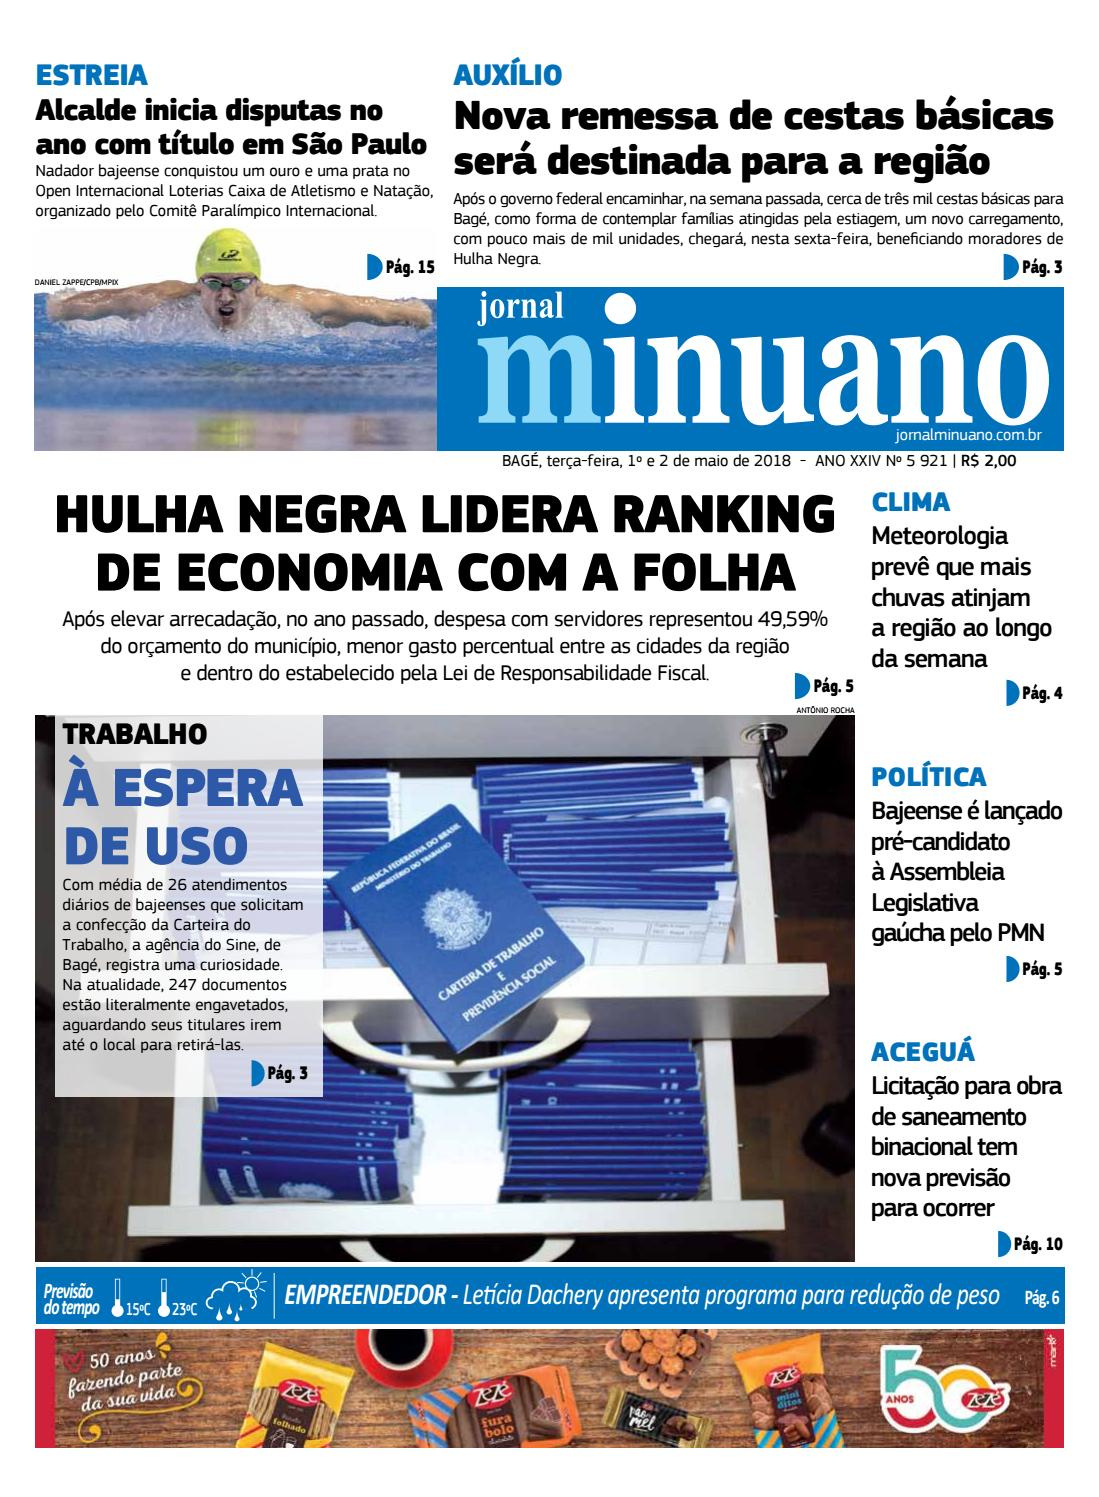 da4a46c29 20180501 by Jornal Minuano - issuu